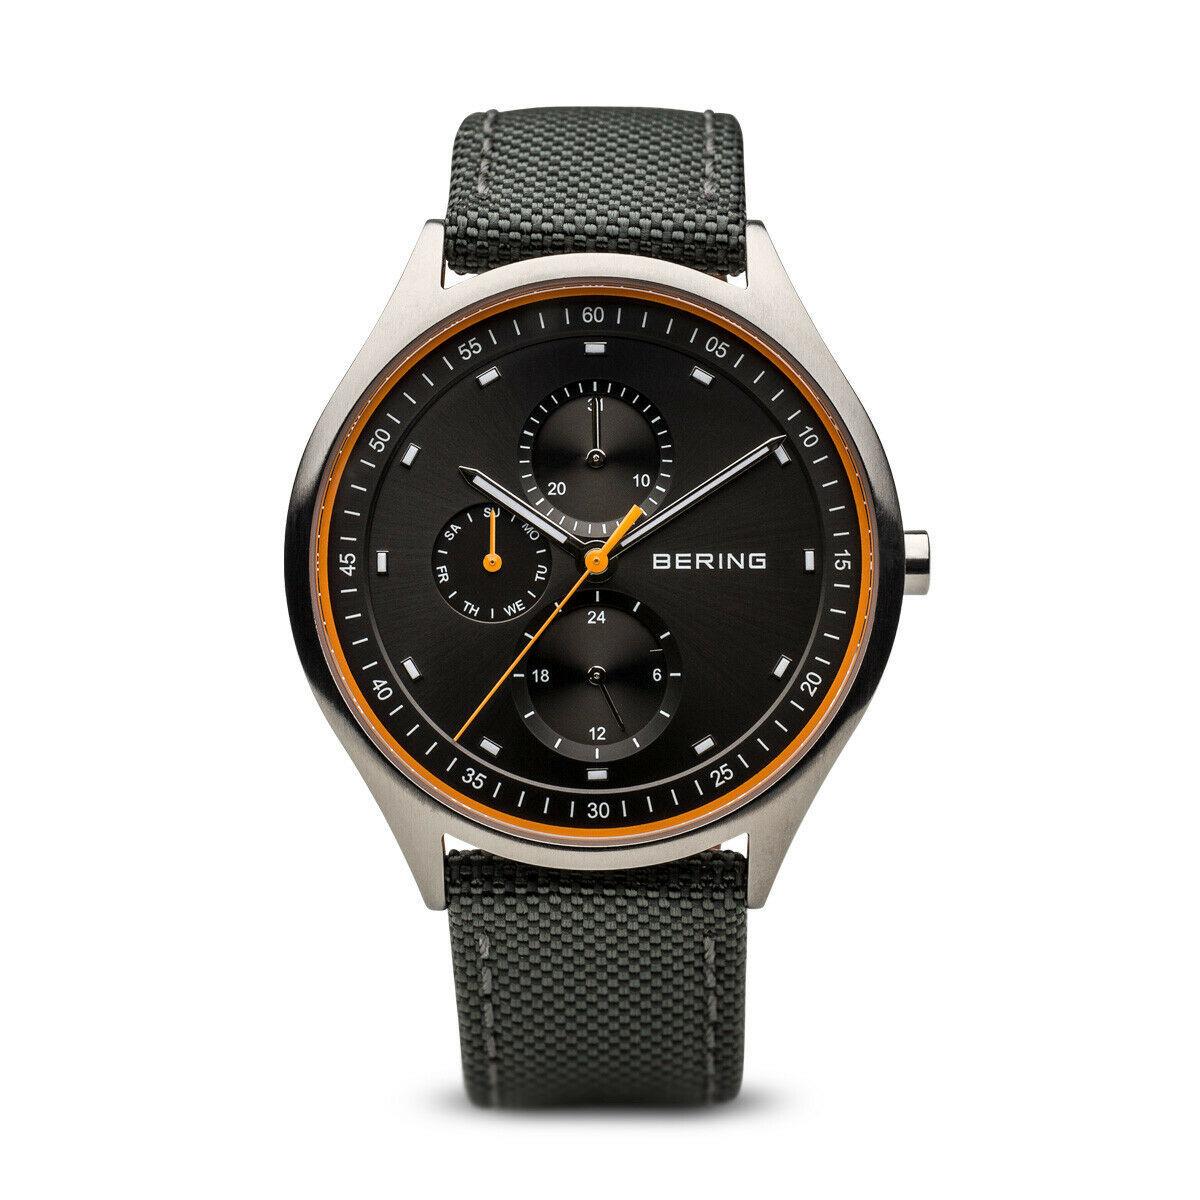 BERING Time Men's Titanium Collection Nylon Strap Watch 41mm - 11741-879